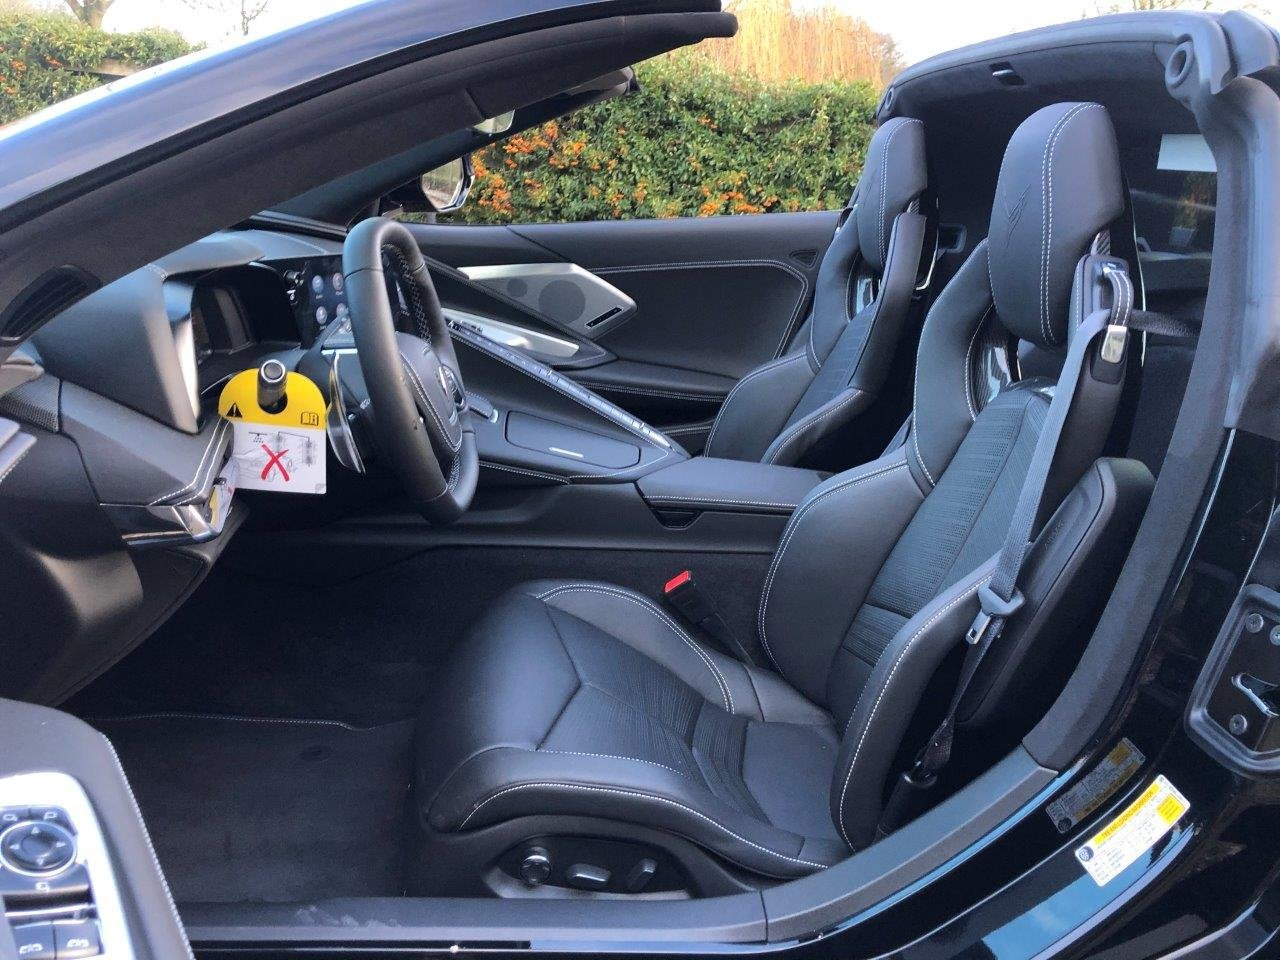 2020 Chevrolet Corvette C8 Z51 Stingray 3LT Coupe For Sale (picture 8 of 12)